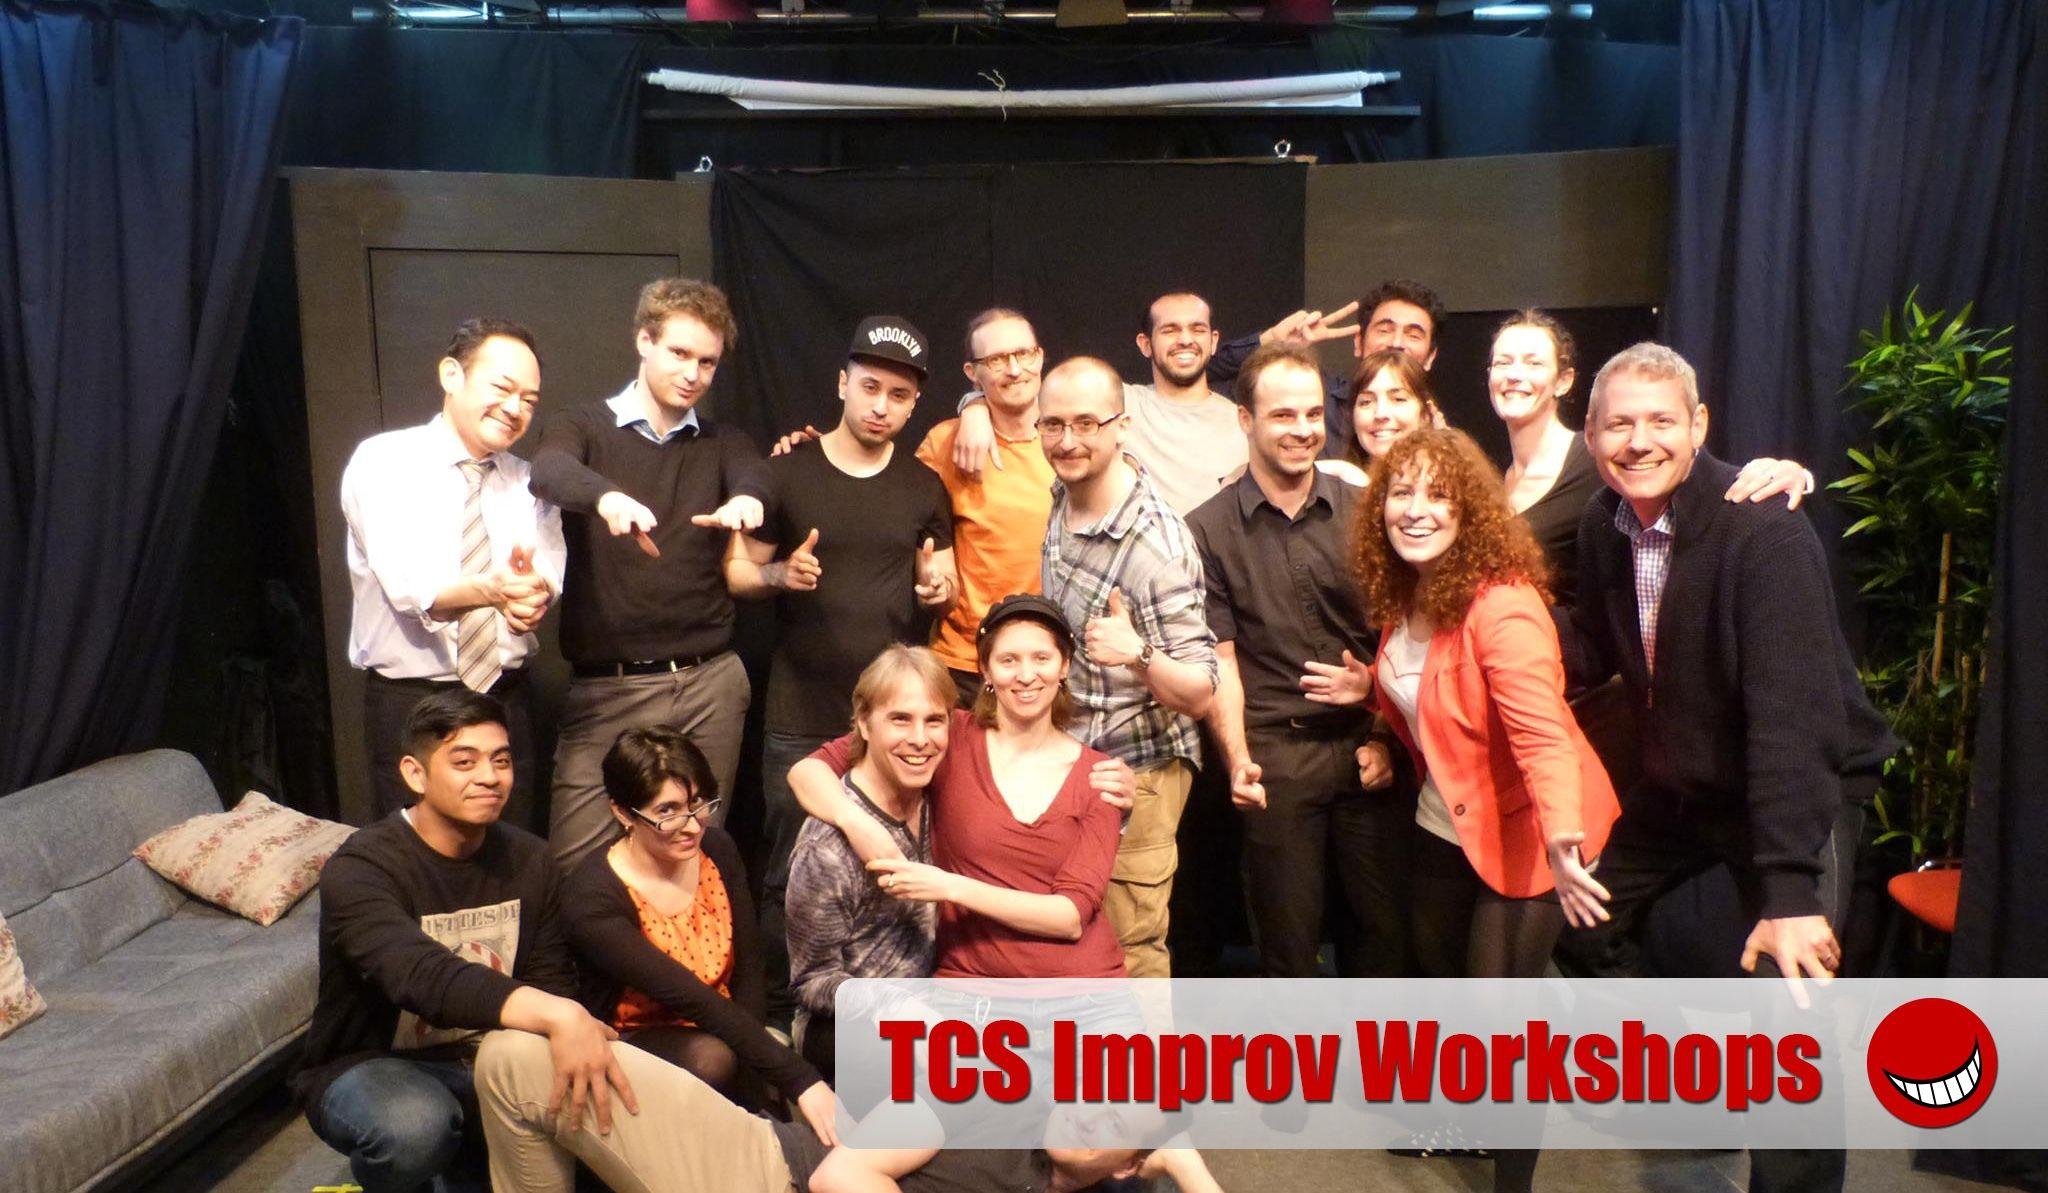 TCS Improv Foundation Thursday 2-hour Worksho